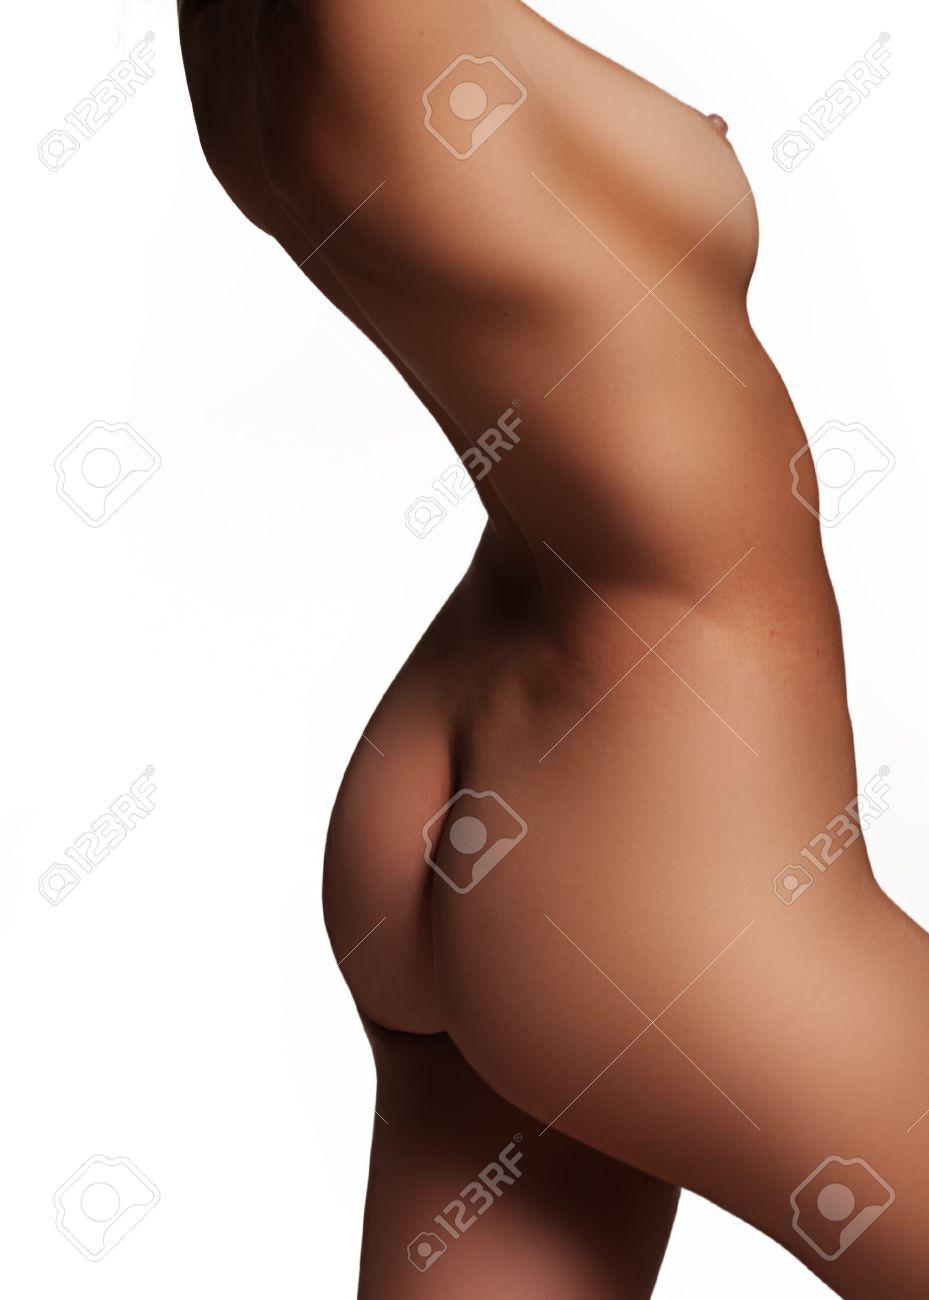 Sushma karki xxx